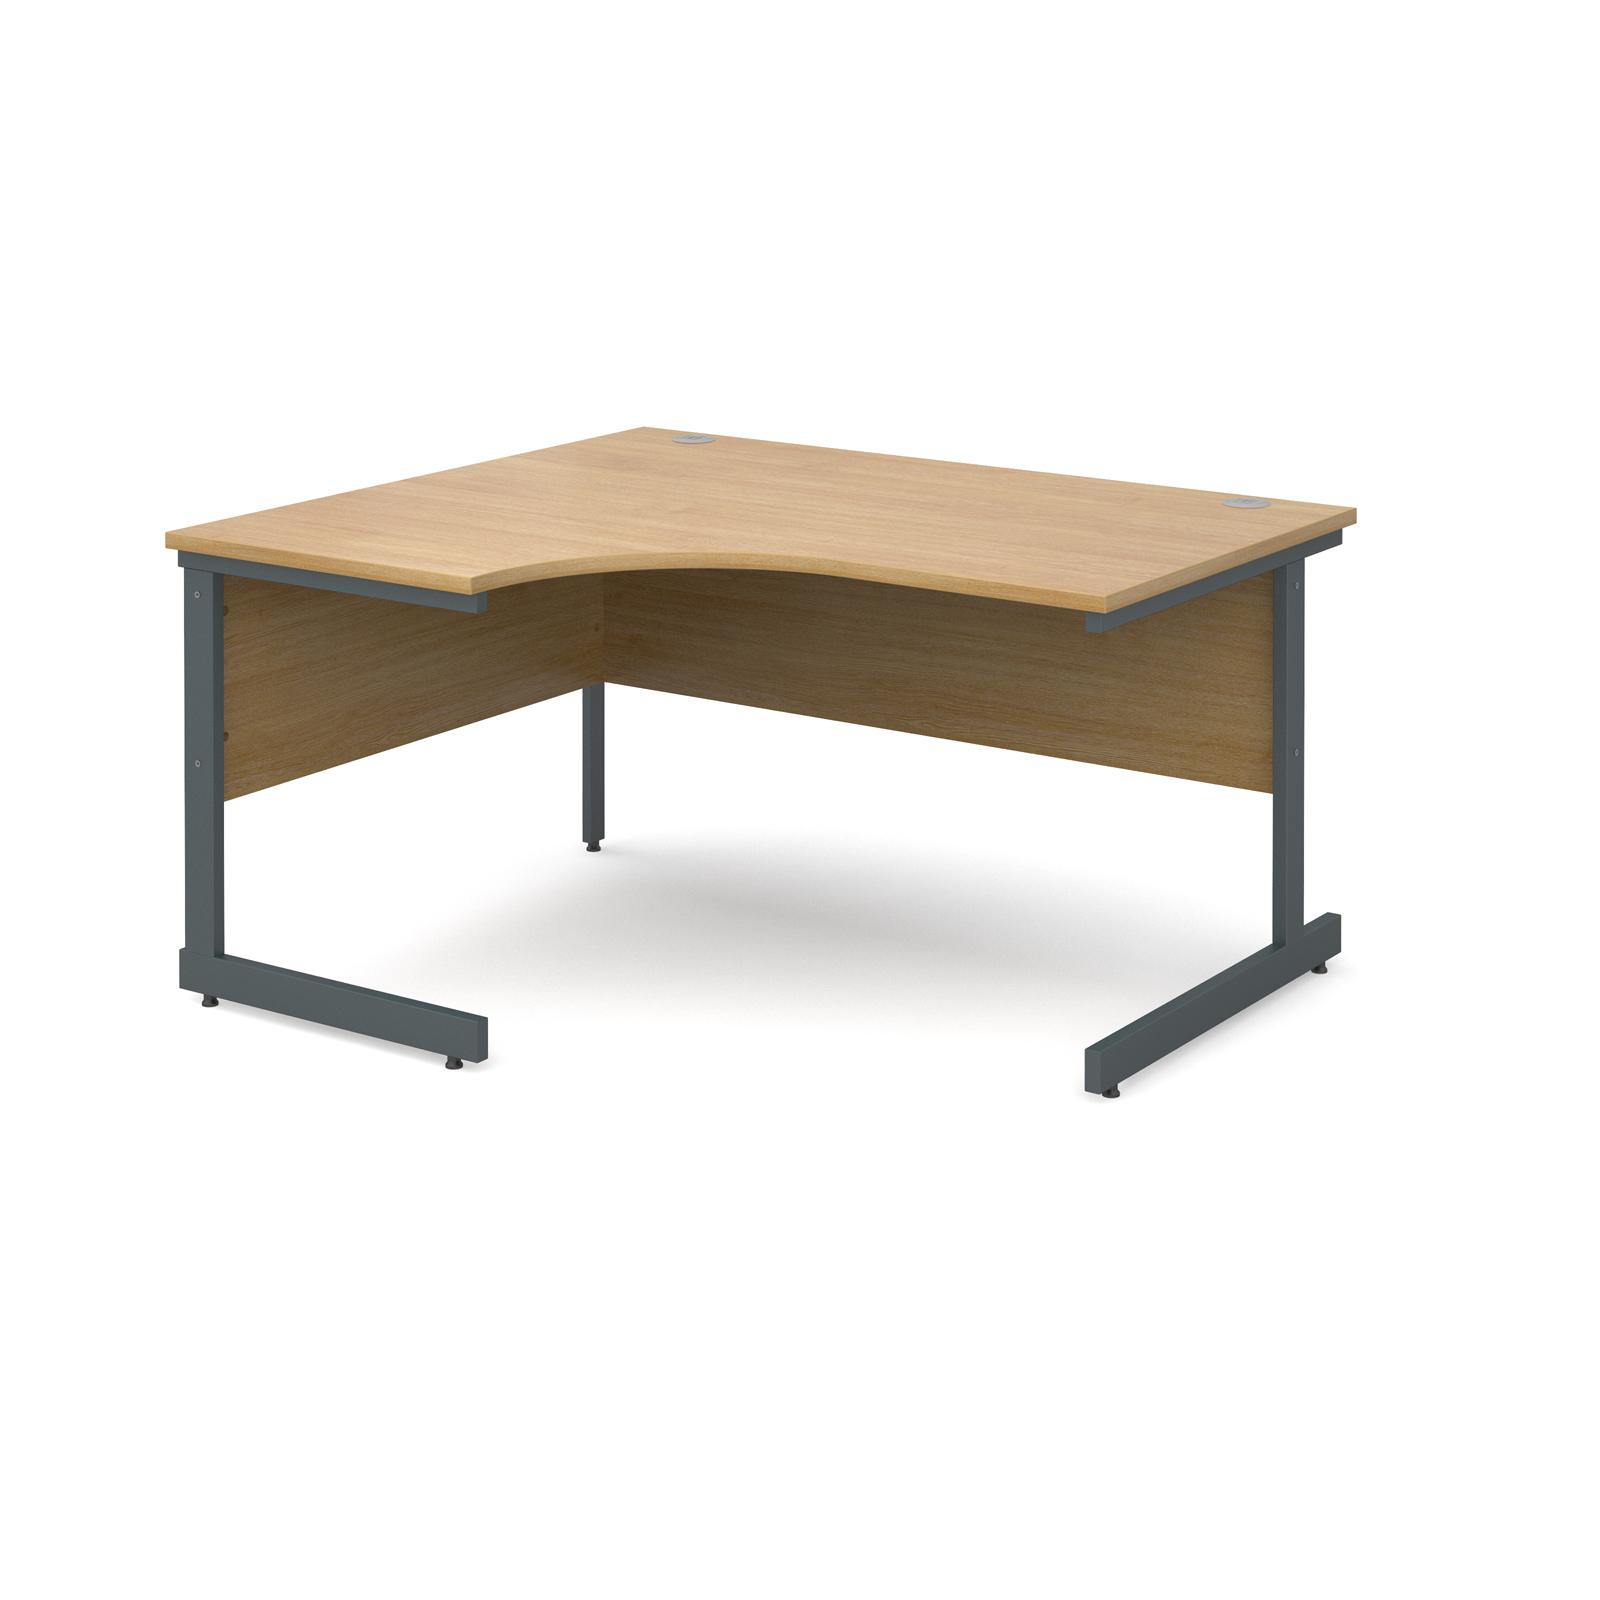 Contract 25 left hand ergonomic desk 1400mm - graphite cantilever frame, oak top